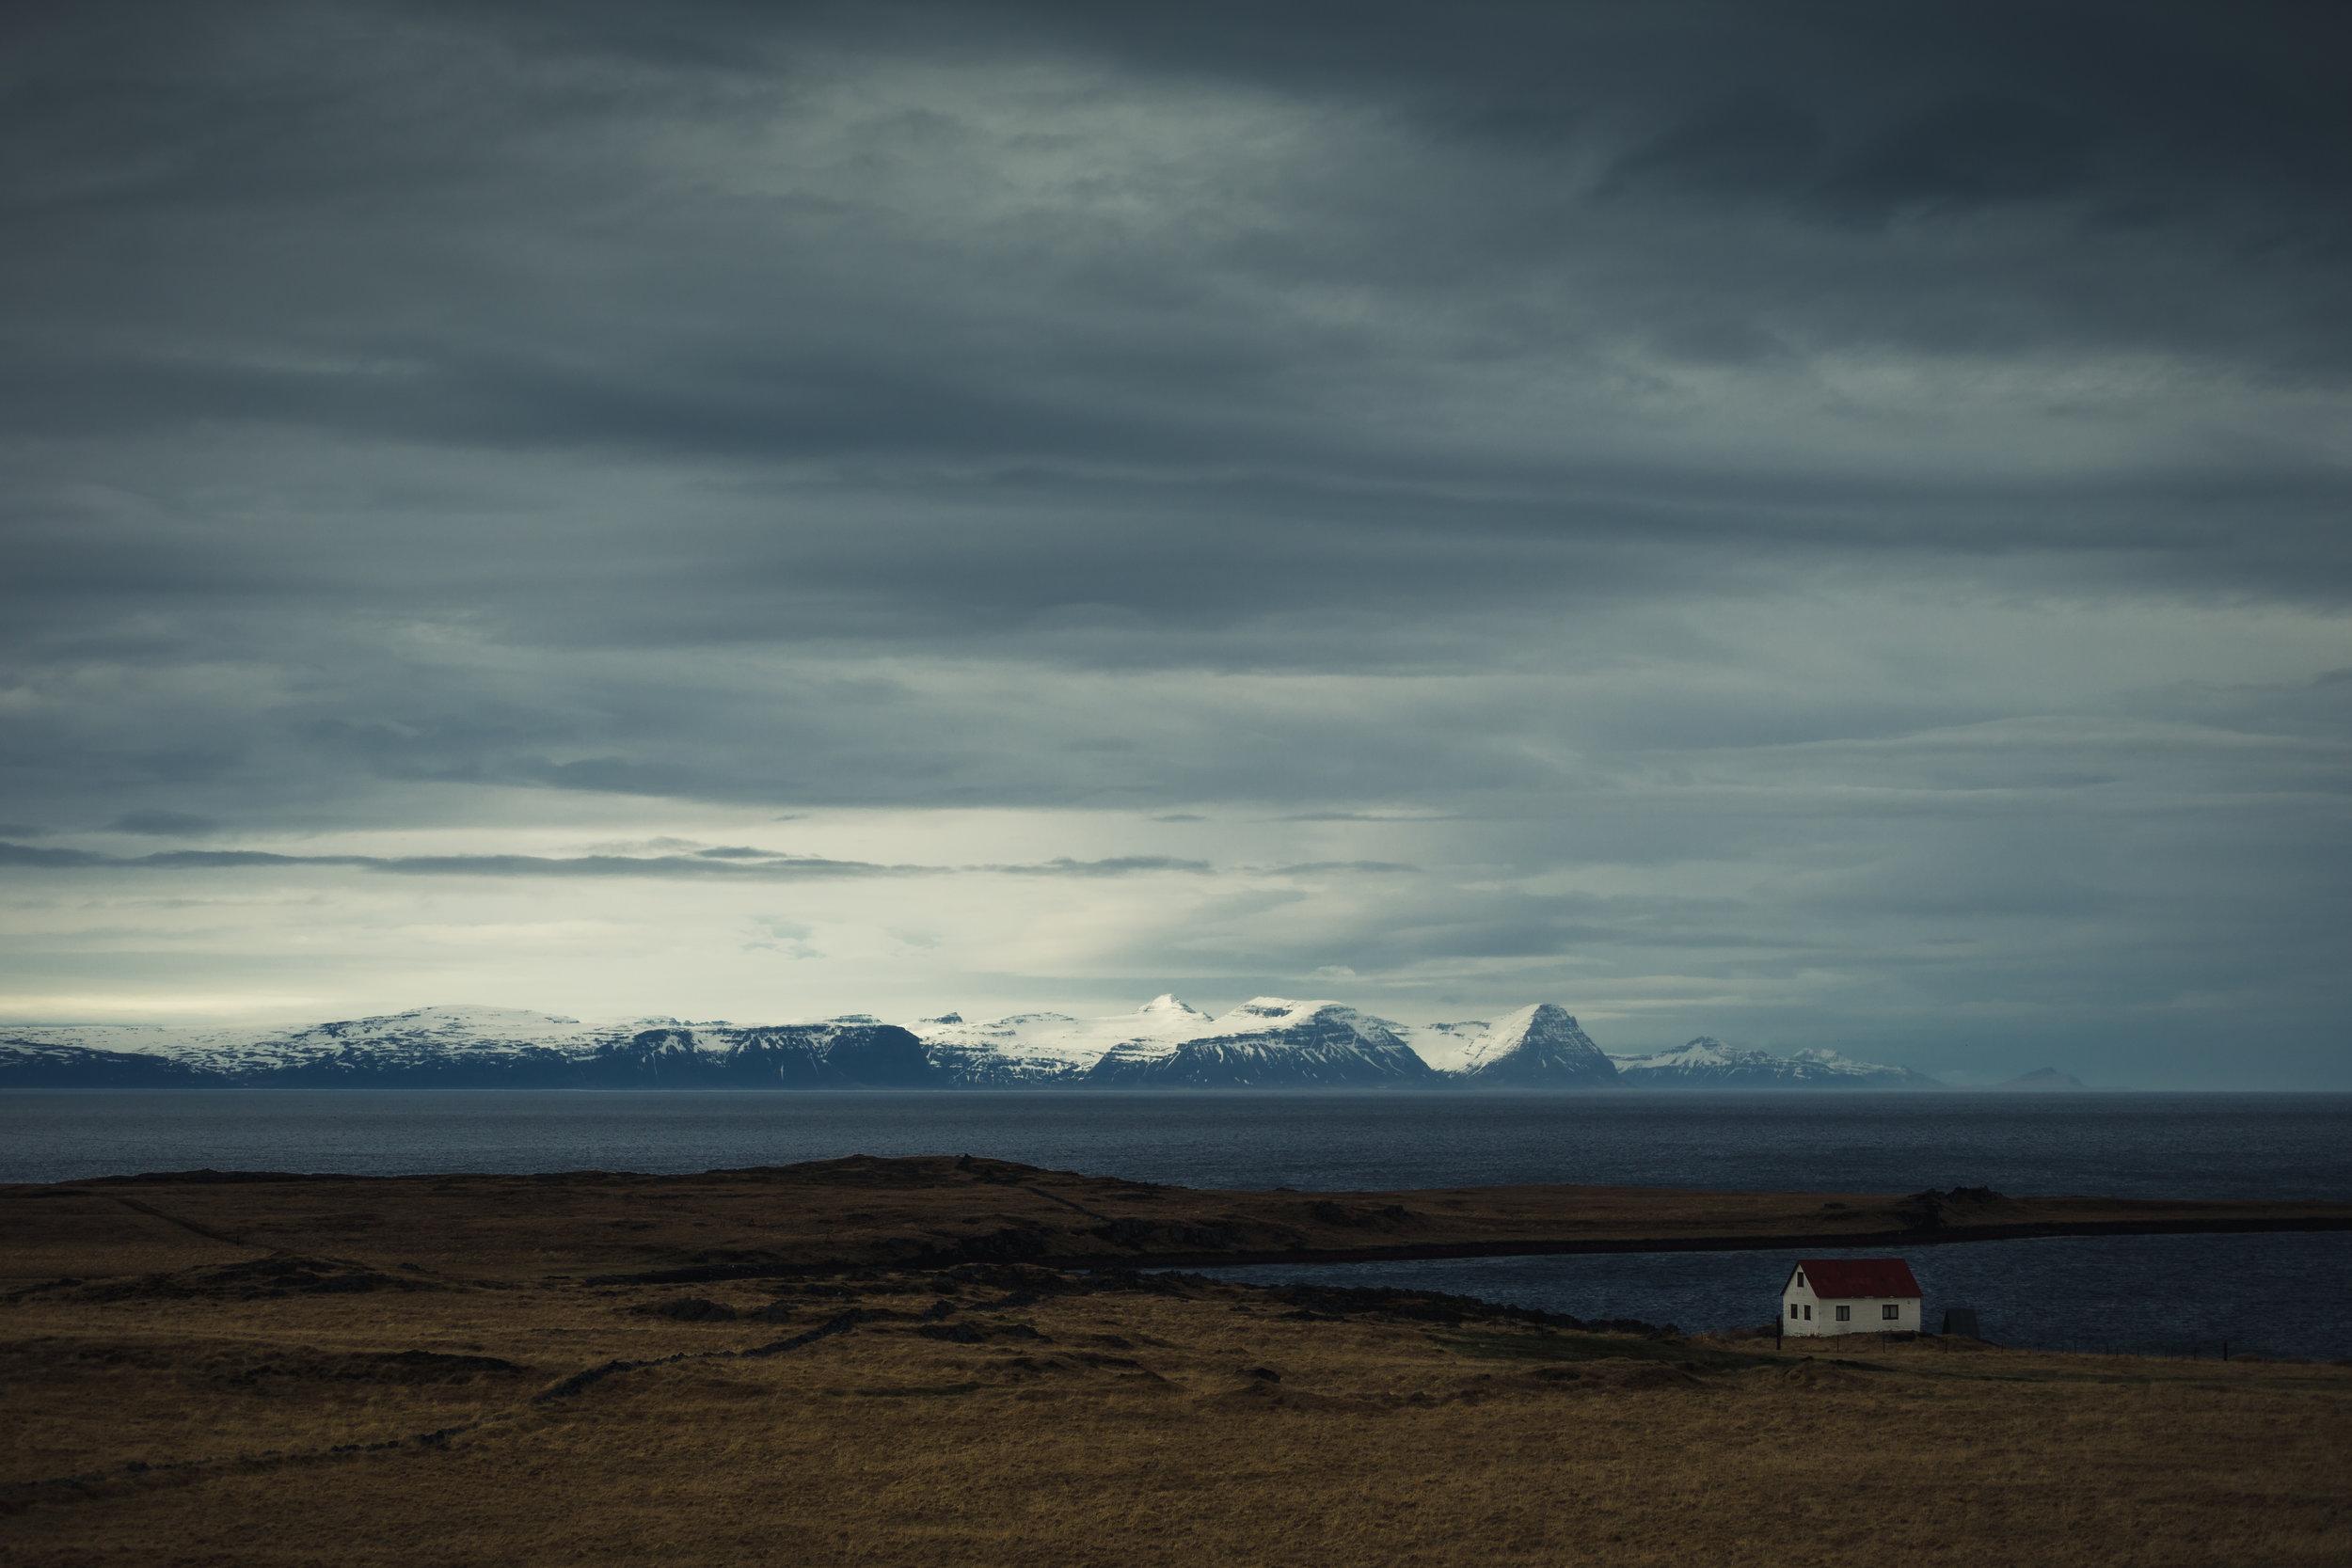 Iceland, Varmahlid - May 2nd, 2017